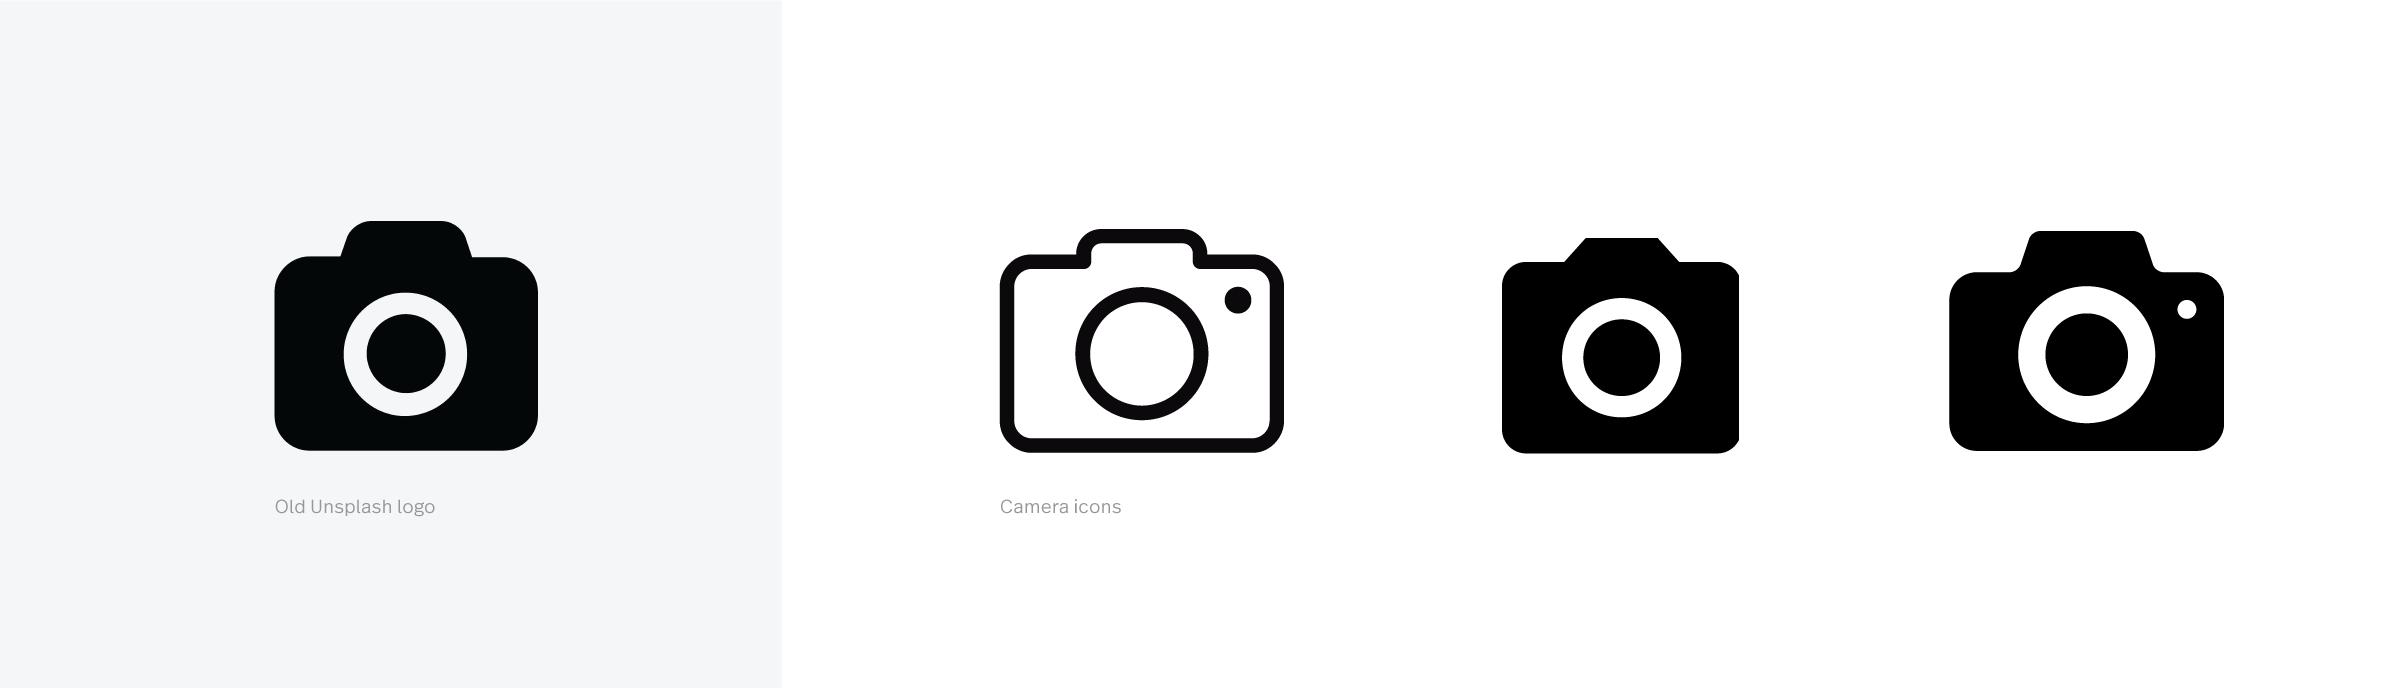 Unsplash_CaseStudy_OldIcons